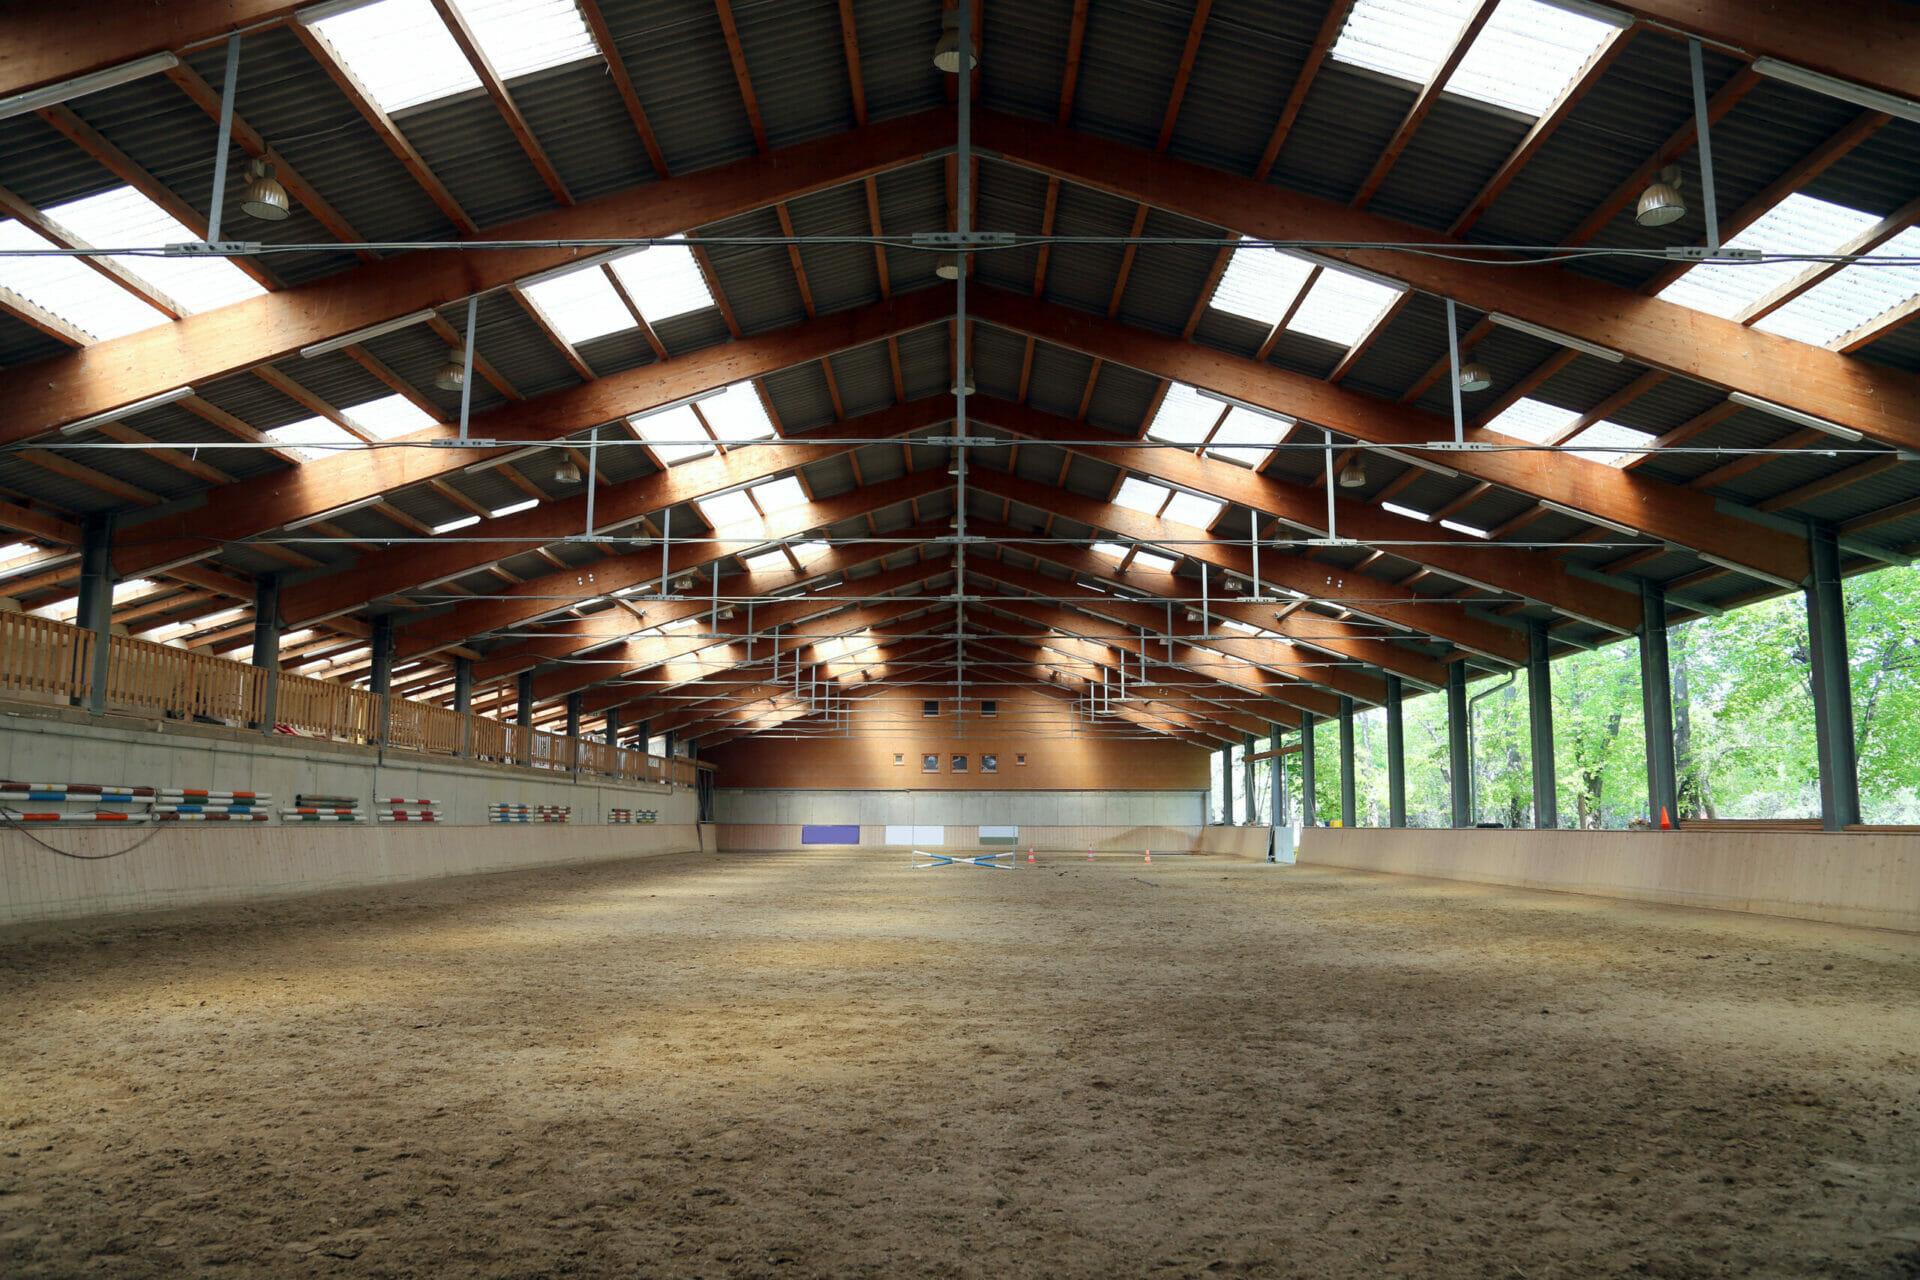 Large Pre-Engineered Metal Horse Arena Interior With Steel Beams